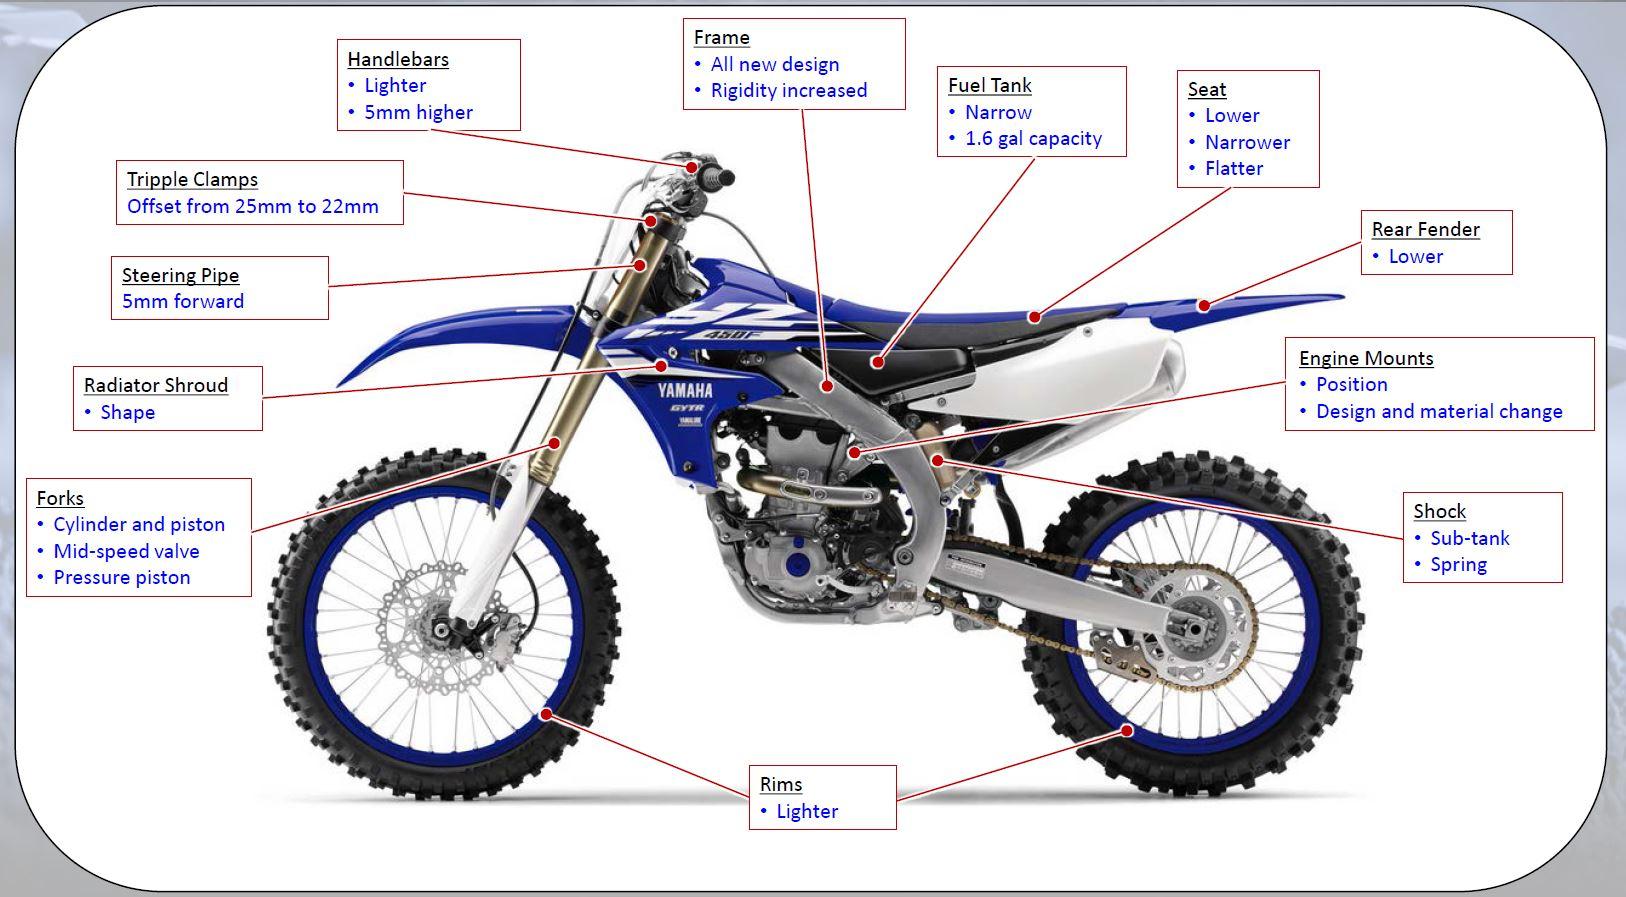 Remarkable Yamaha Motocross Bikes 2018 Dirt Bike Magazine Wiring Cloud Xeiraioscosaoduqqnet